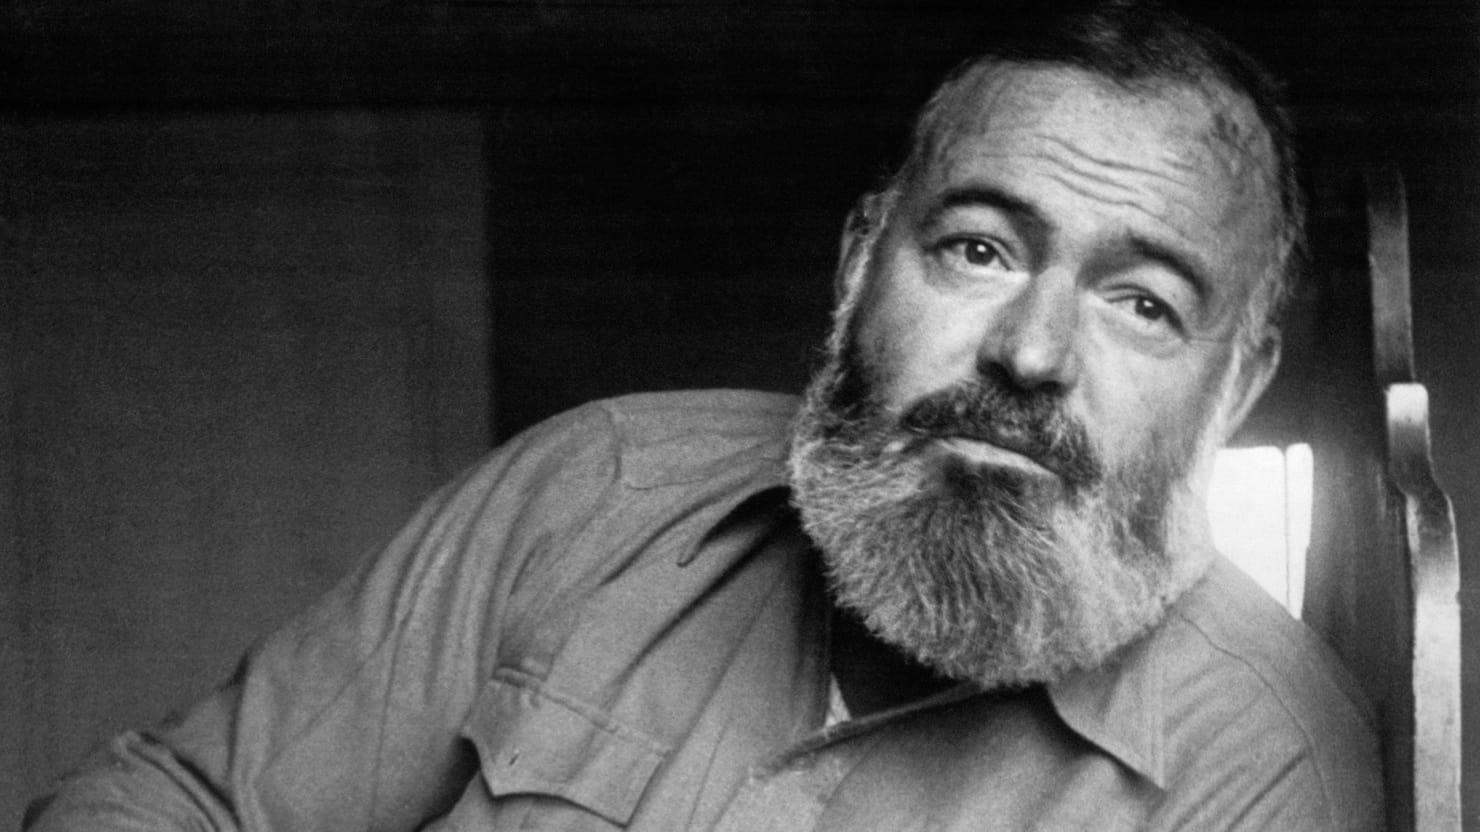 Still love ya, Hemingway.